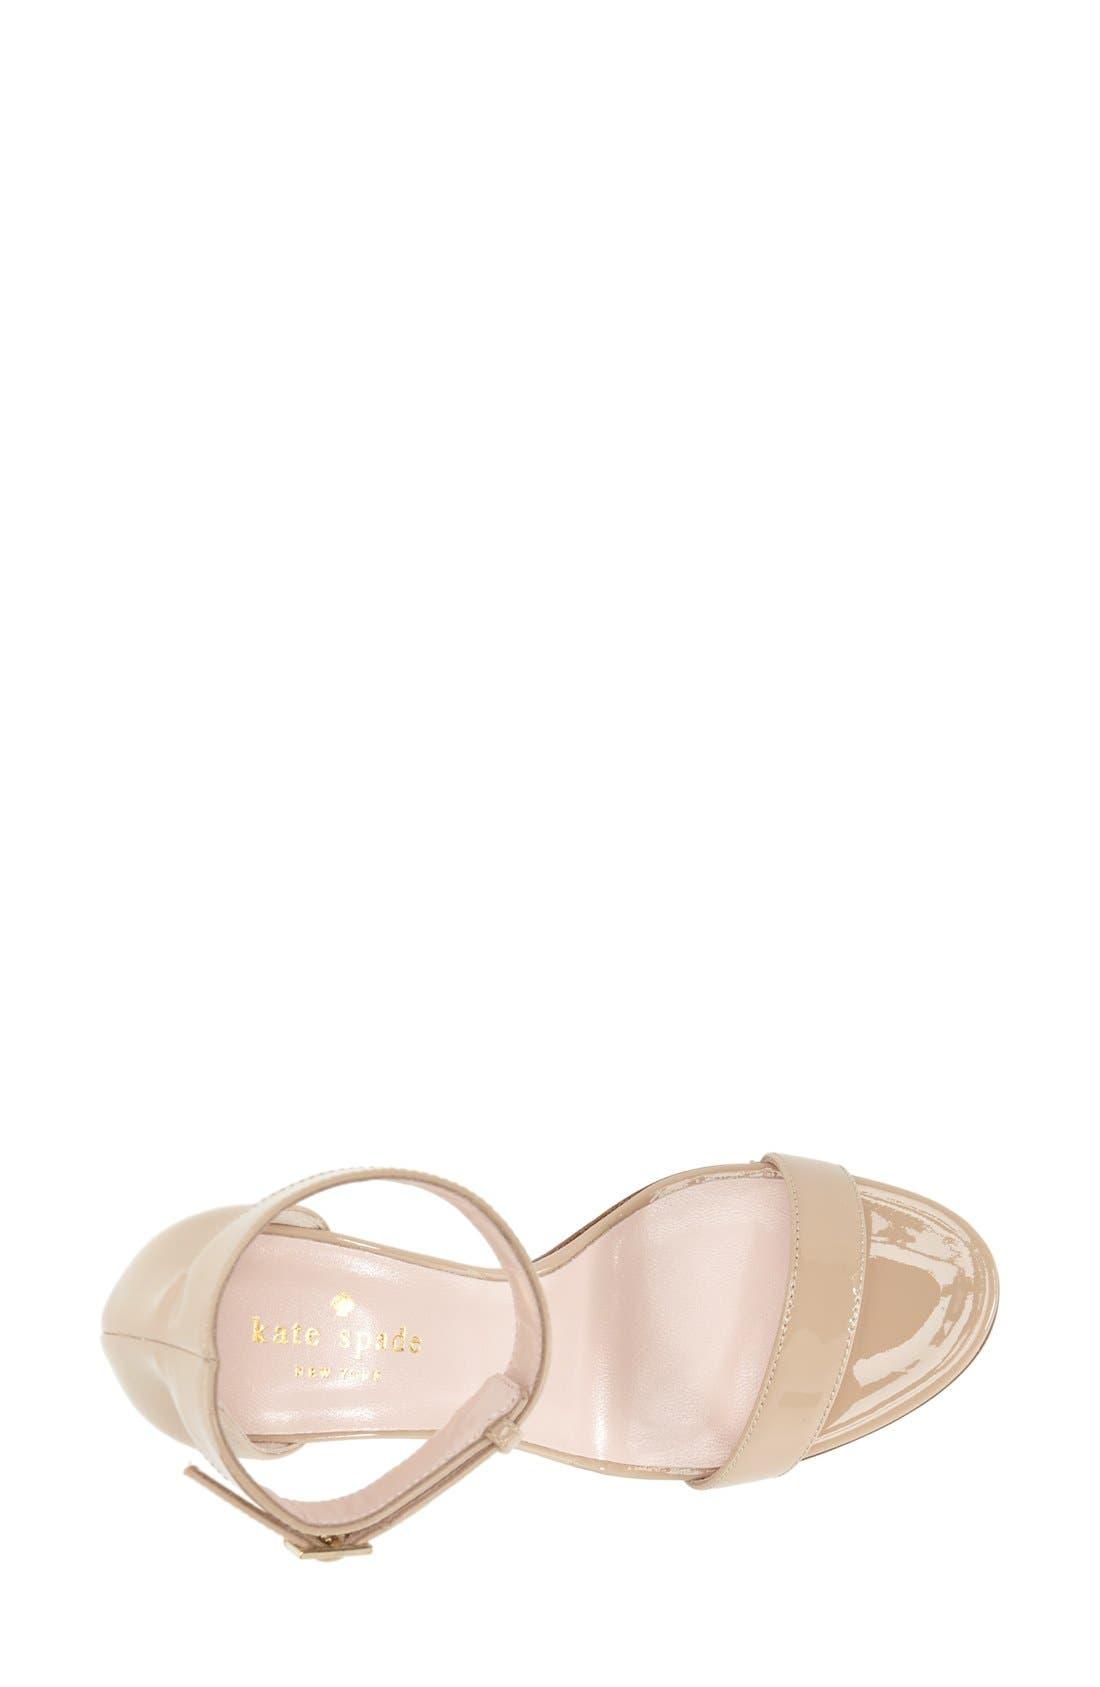 Alternate Image 3  - kate spade new york 'isa' ankle strap sandal (Women)